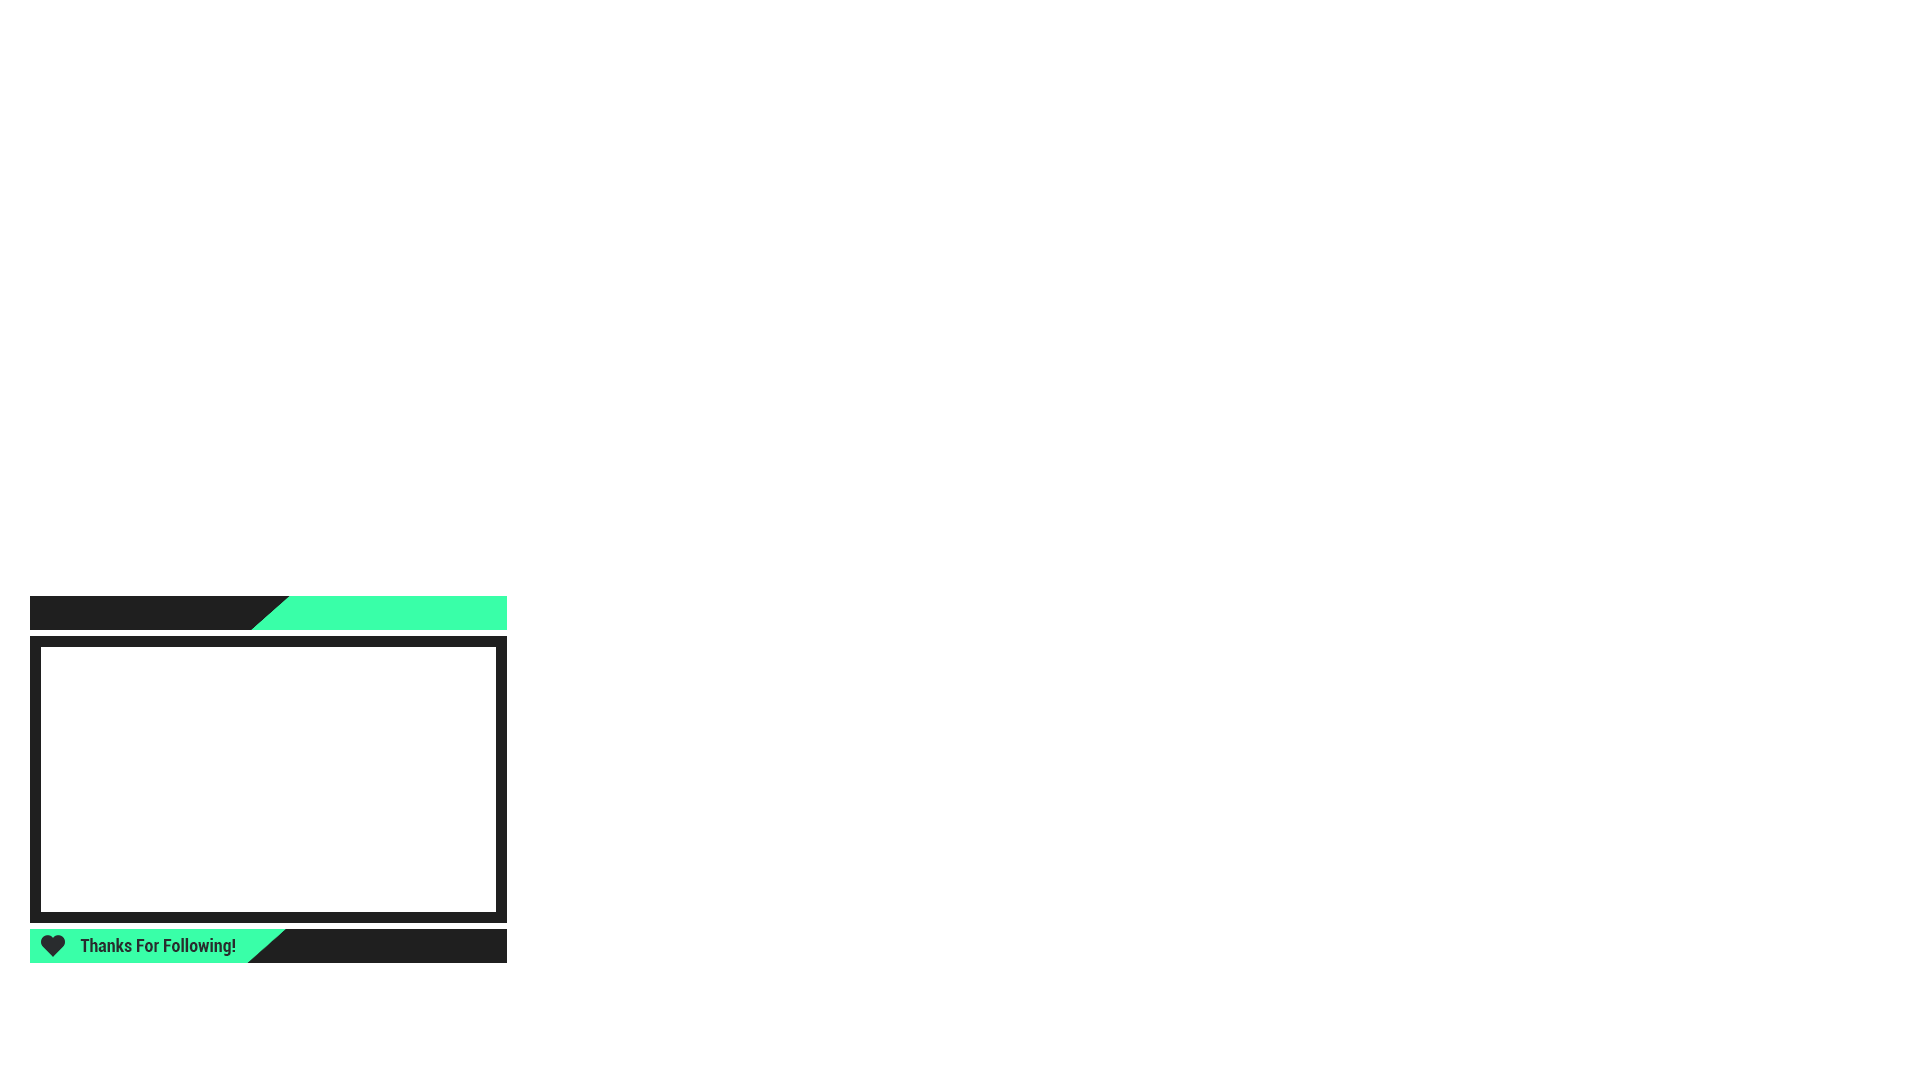 Flat Design Twitch Webcam Overlay [FREE] by KaffeMLG on ...